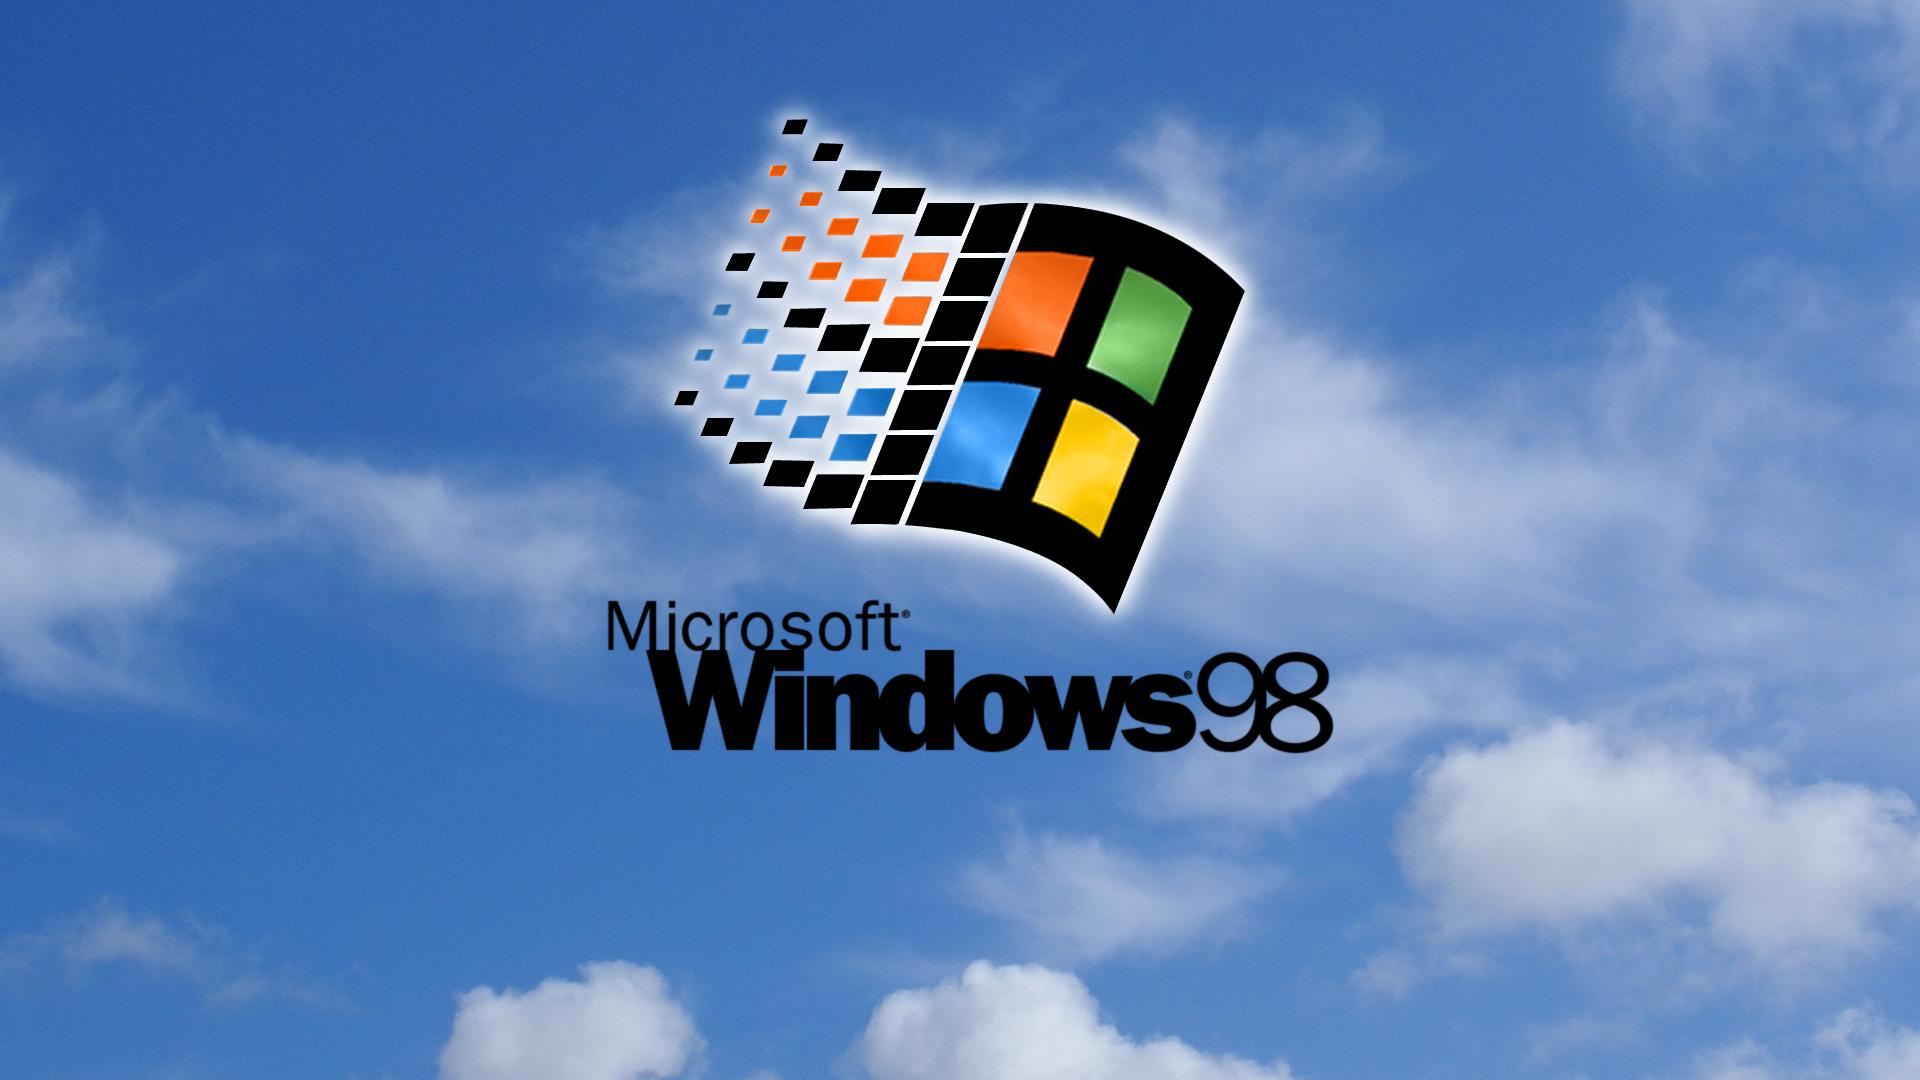 windows 98 wallpaper7 - photo #7